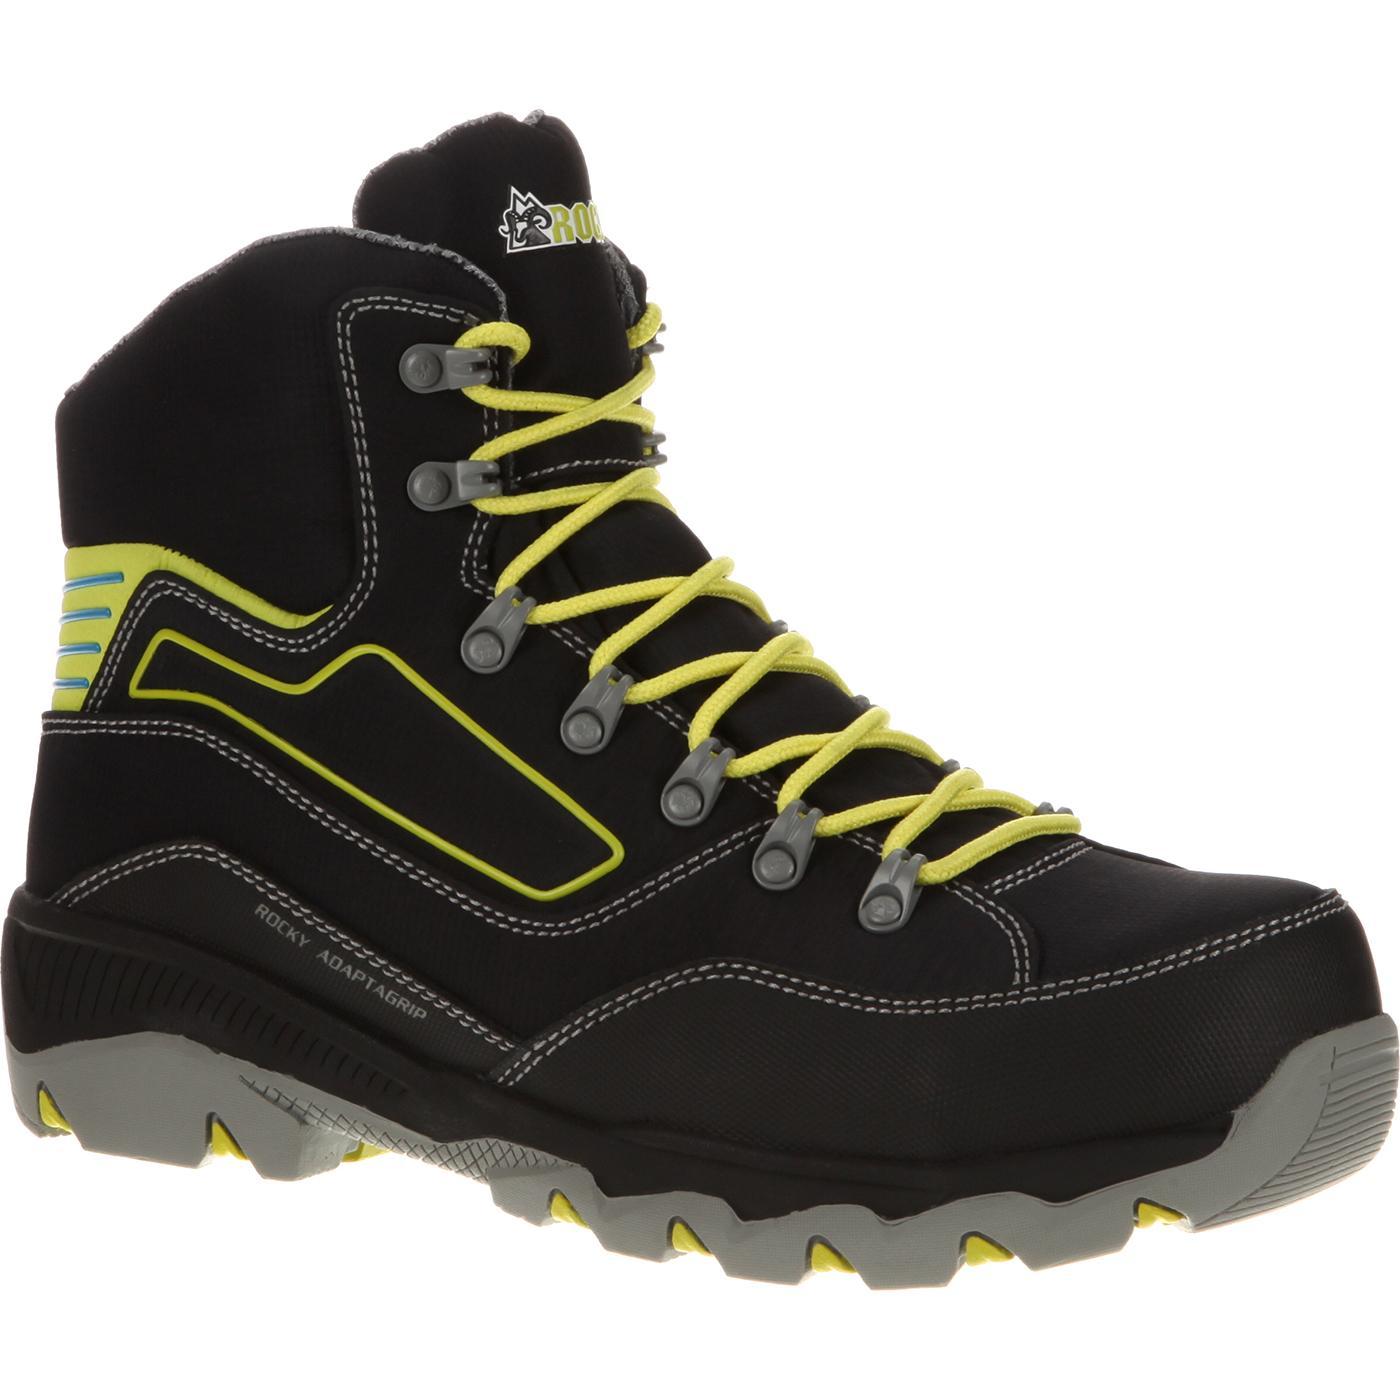 f8d2e8b758f Rocky AdaptaGrip Composite Toe Athletic Work Hiker